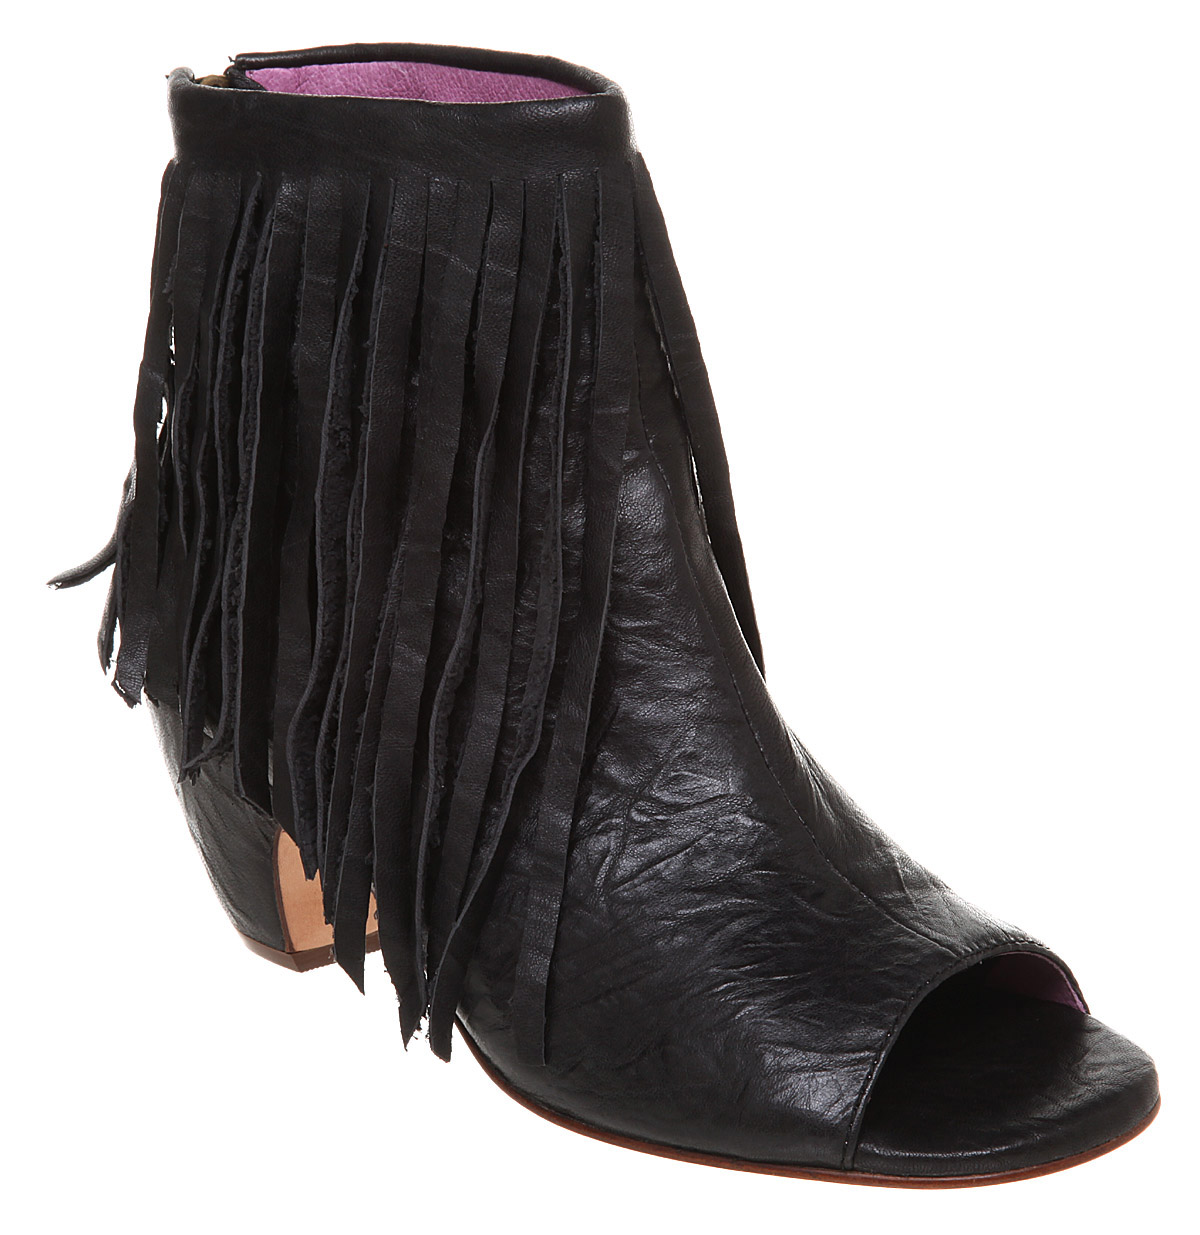 womens gee wawa sally peeptoe fringe boot black leather ebay